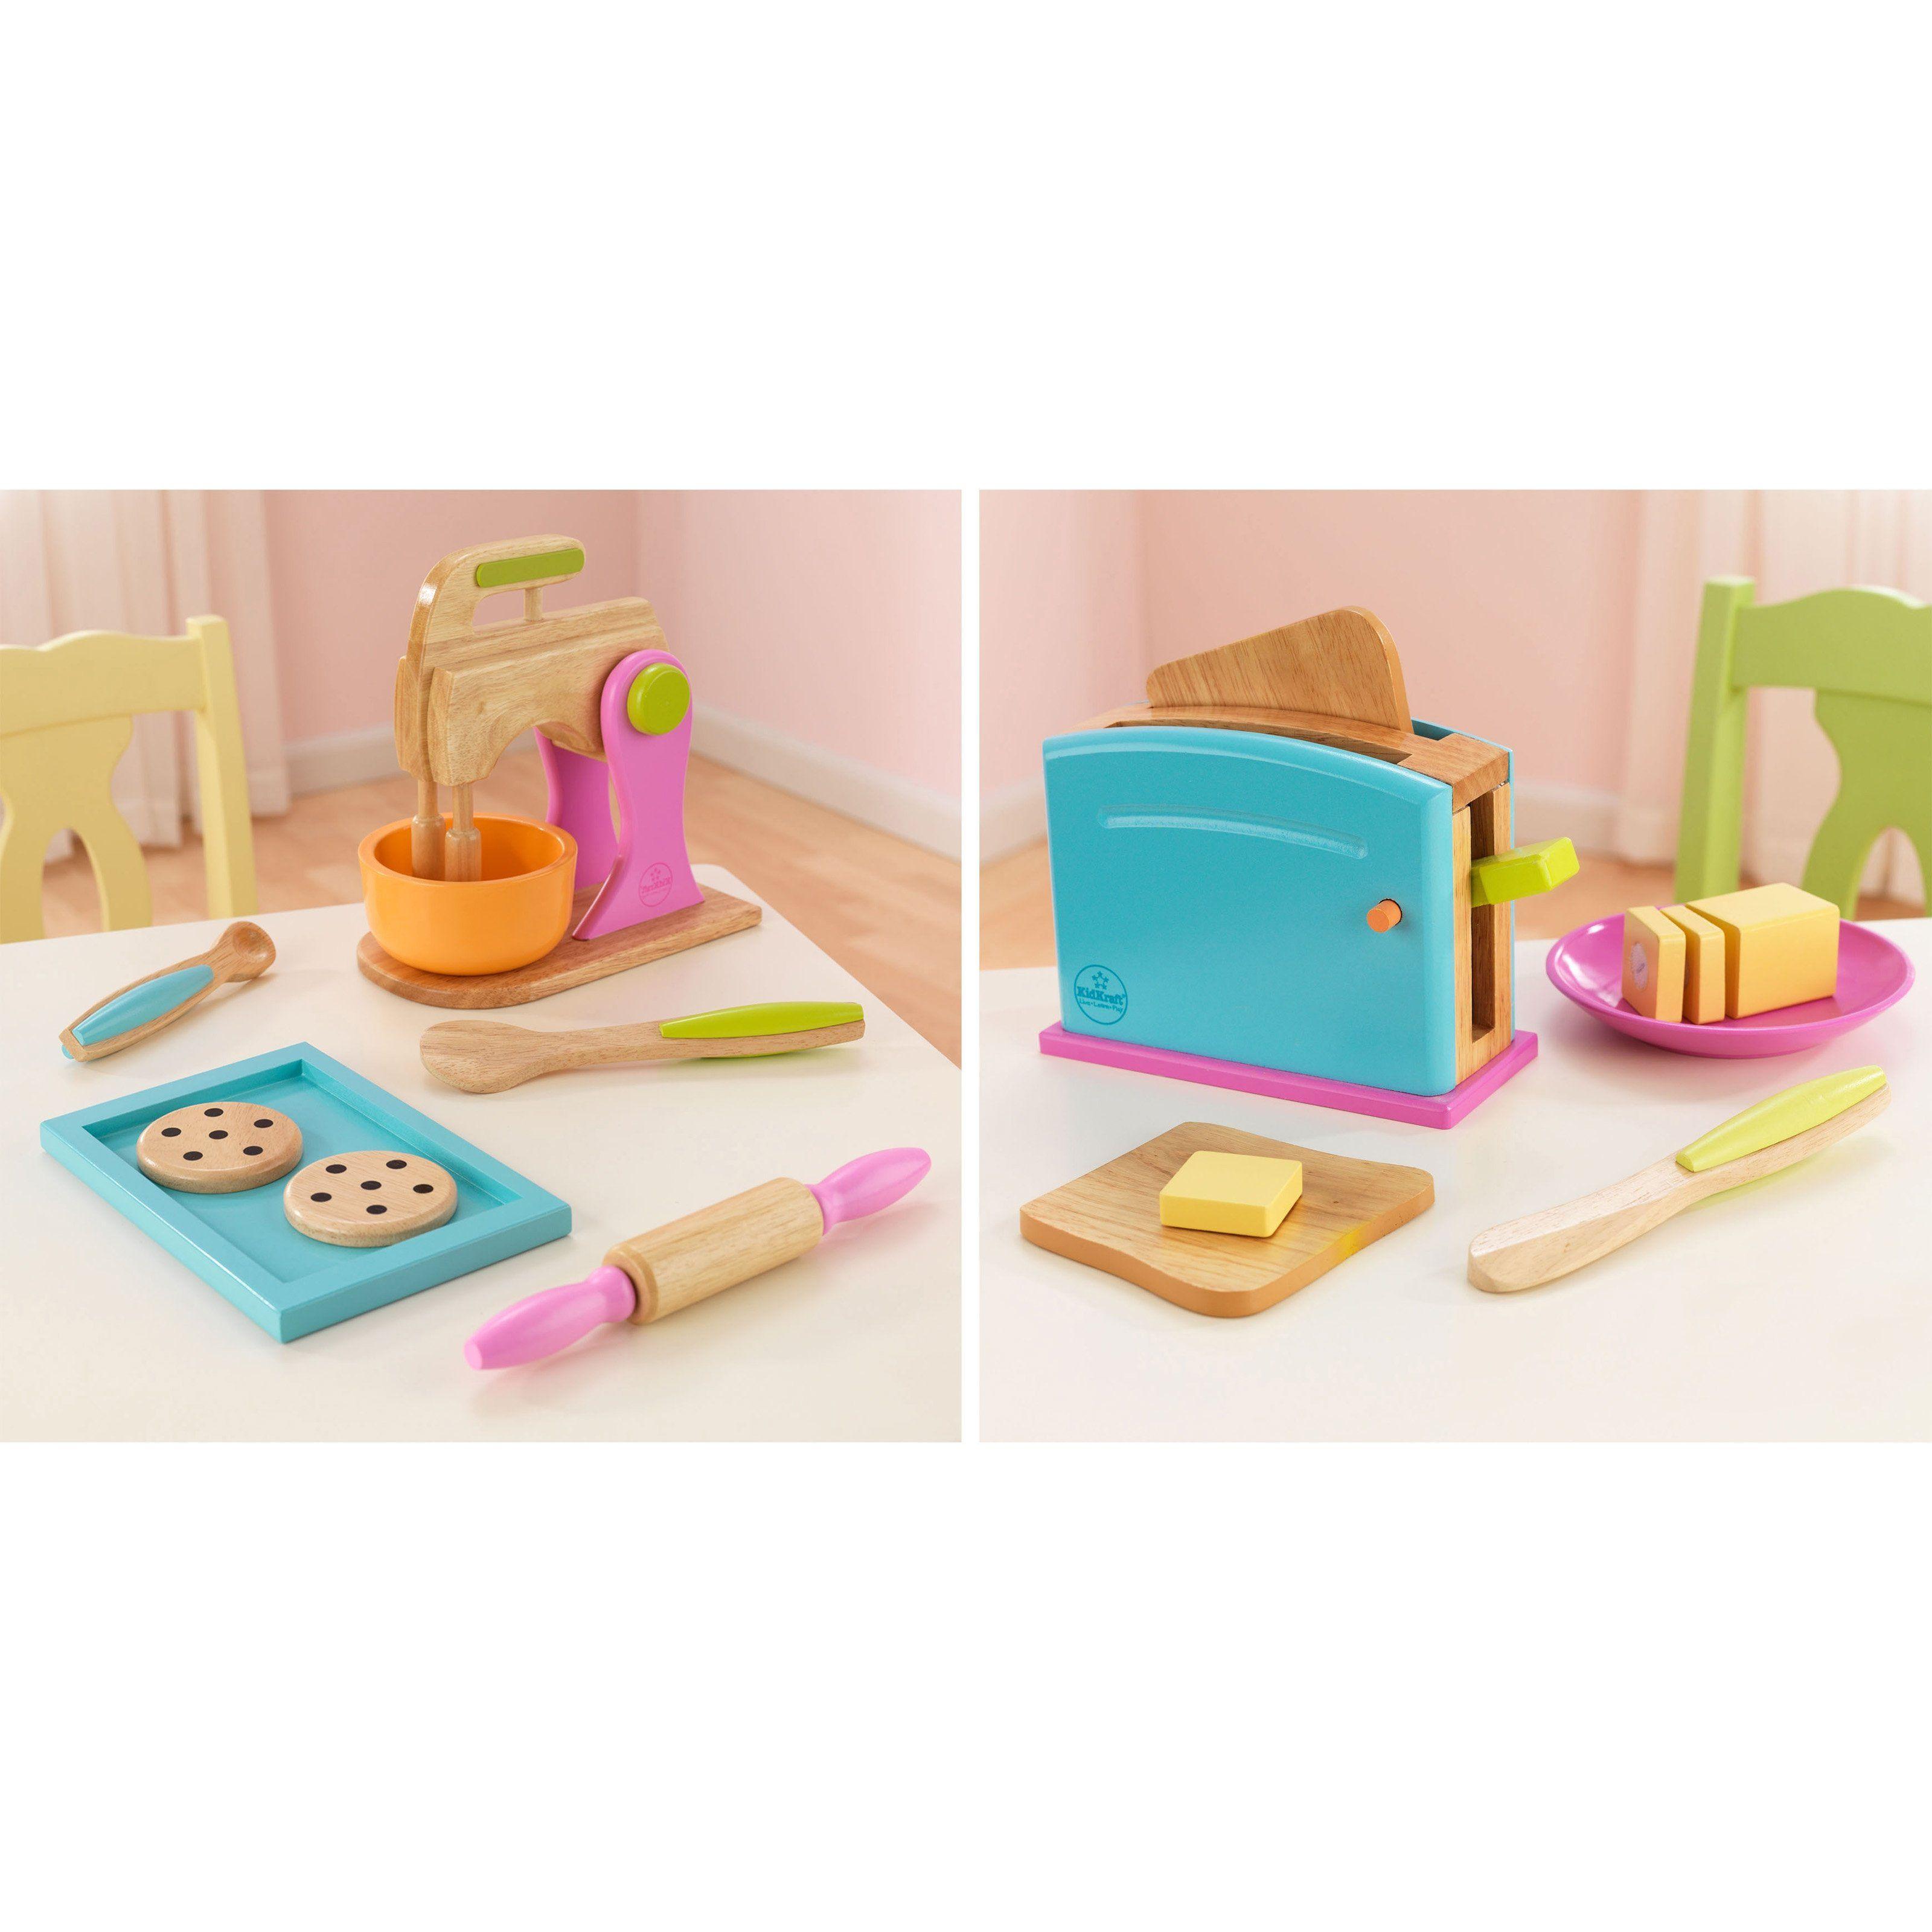 Nice Kidkraft Bright Kitchen Accessories Part - 1: KidKraft Big N Bright Accessory Kit - 2 Pack - $44.99 @hayneedle.com